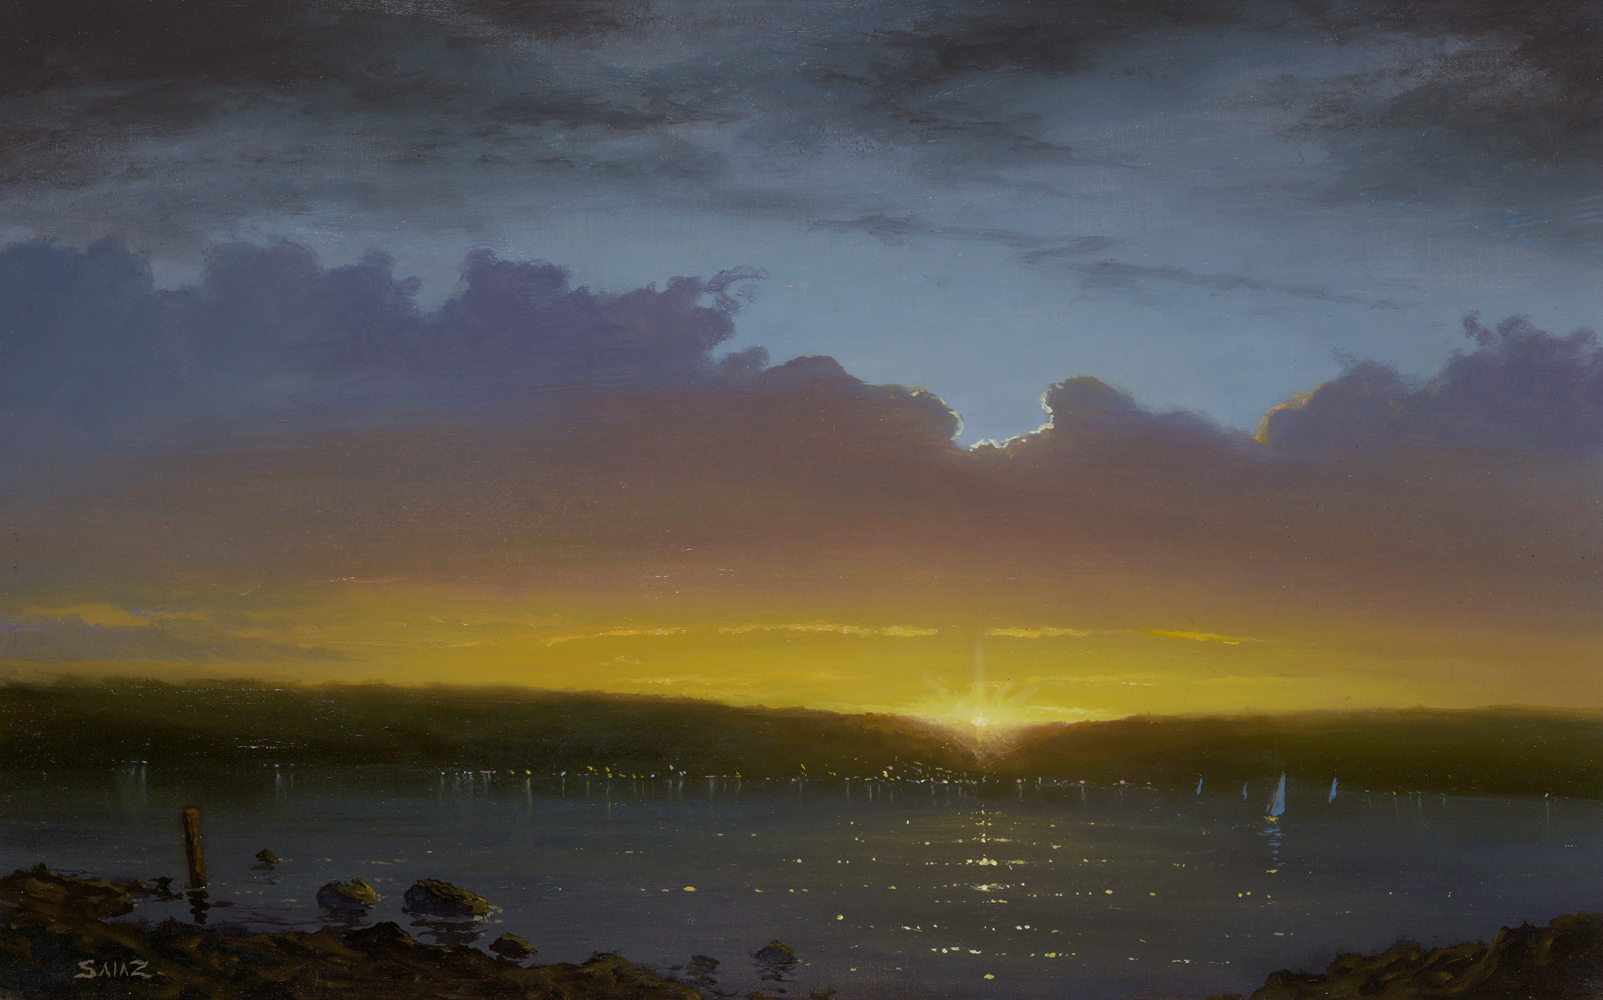 ken_salaz_kws1089_sunset_over_nyack_7_16_17.jpg